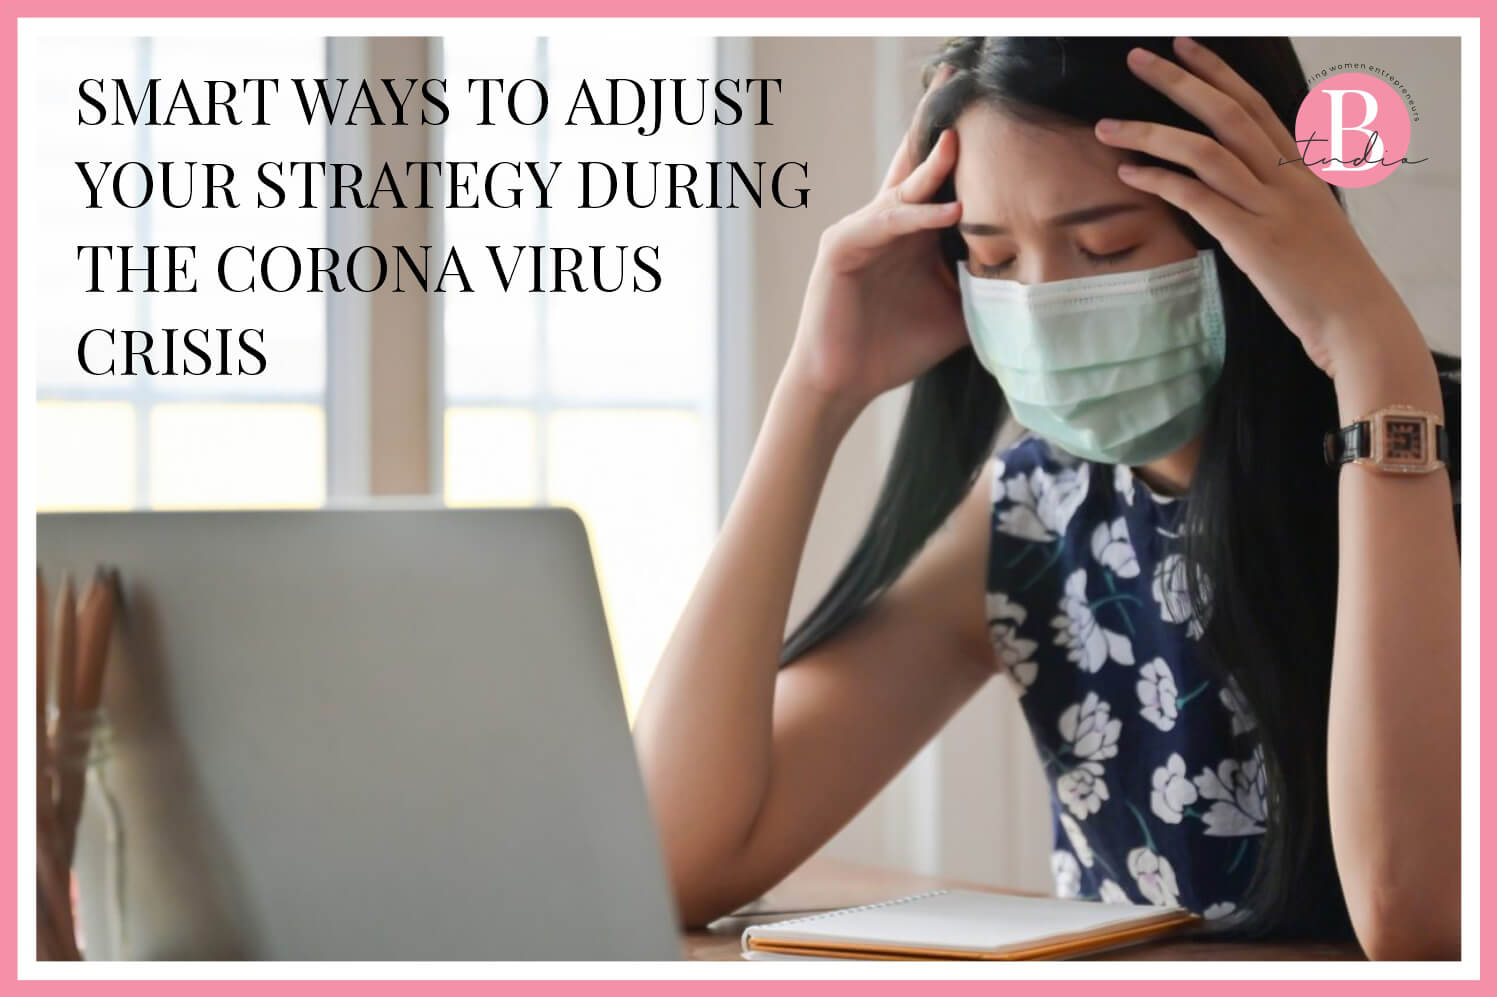 Smart Ways To Adjust Your Strategy During The Coronavirus Crisis img